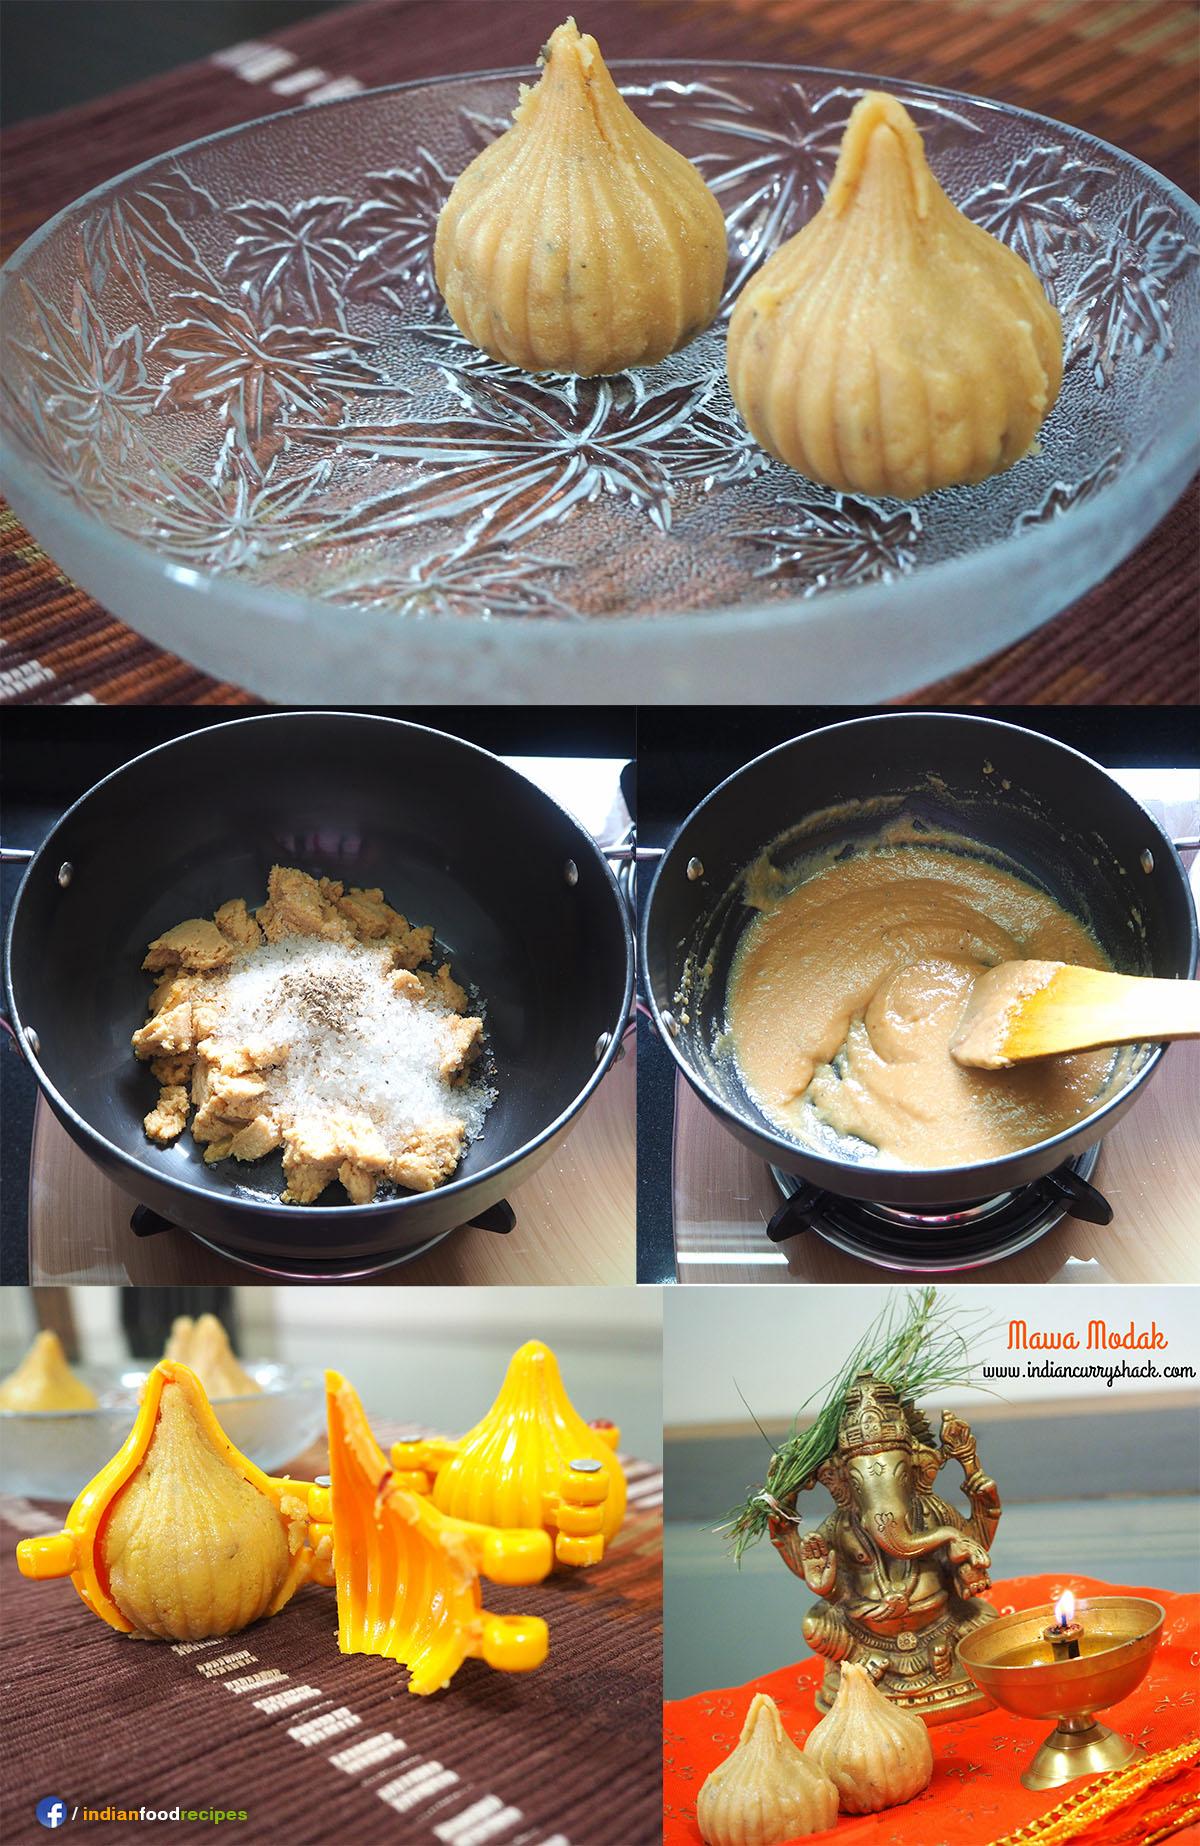 Mawa Modak Dried Milk Dumplings recipe step by step pictures